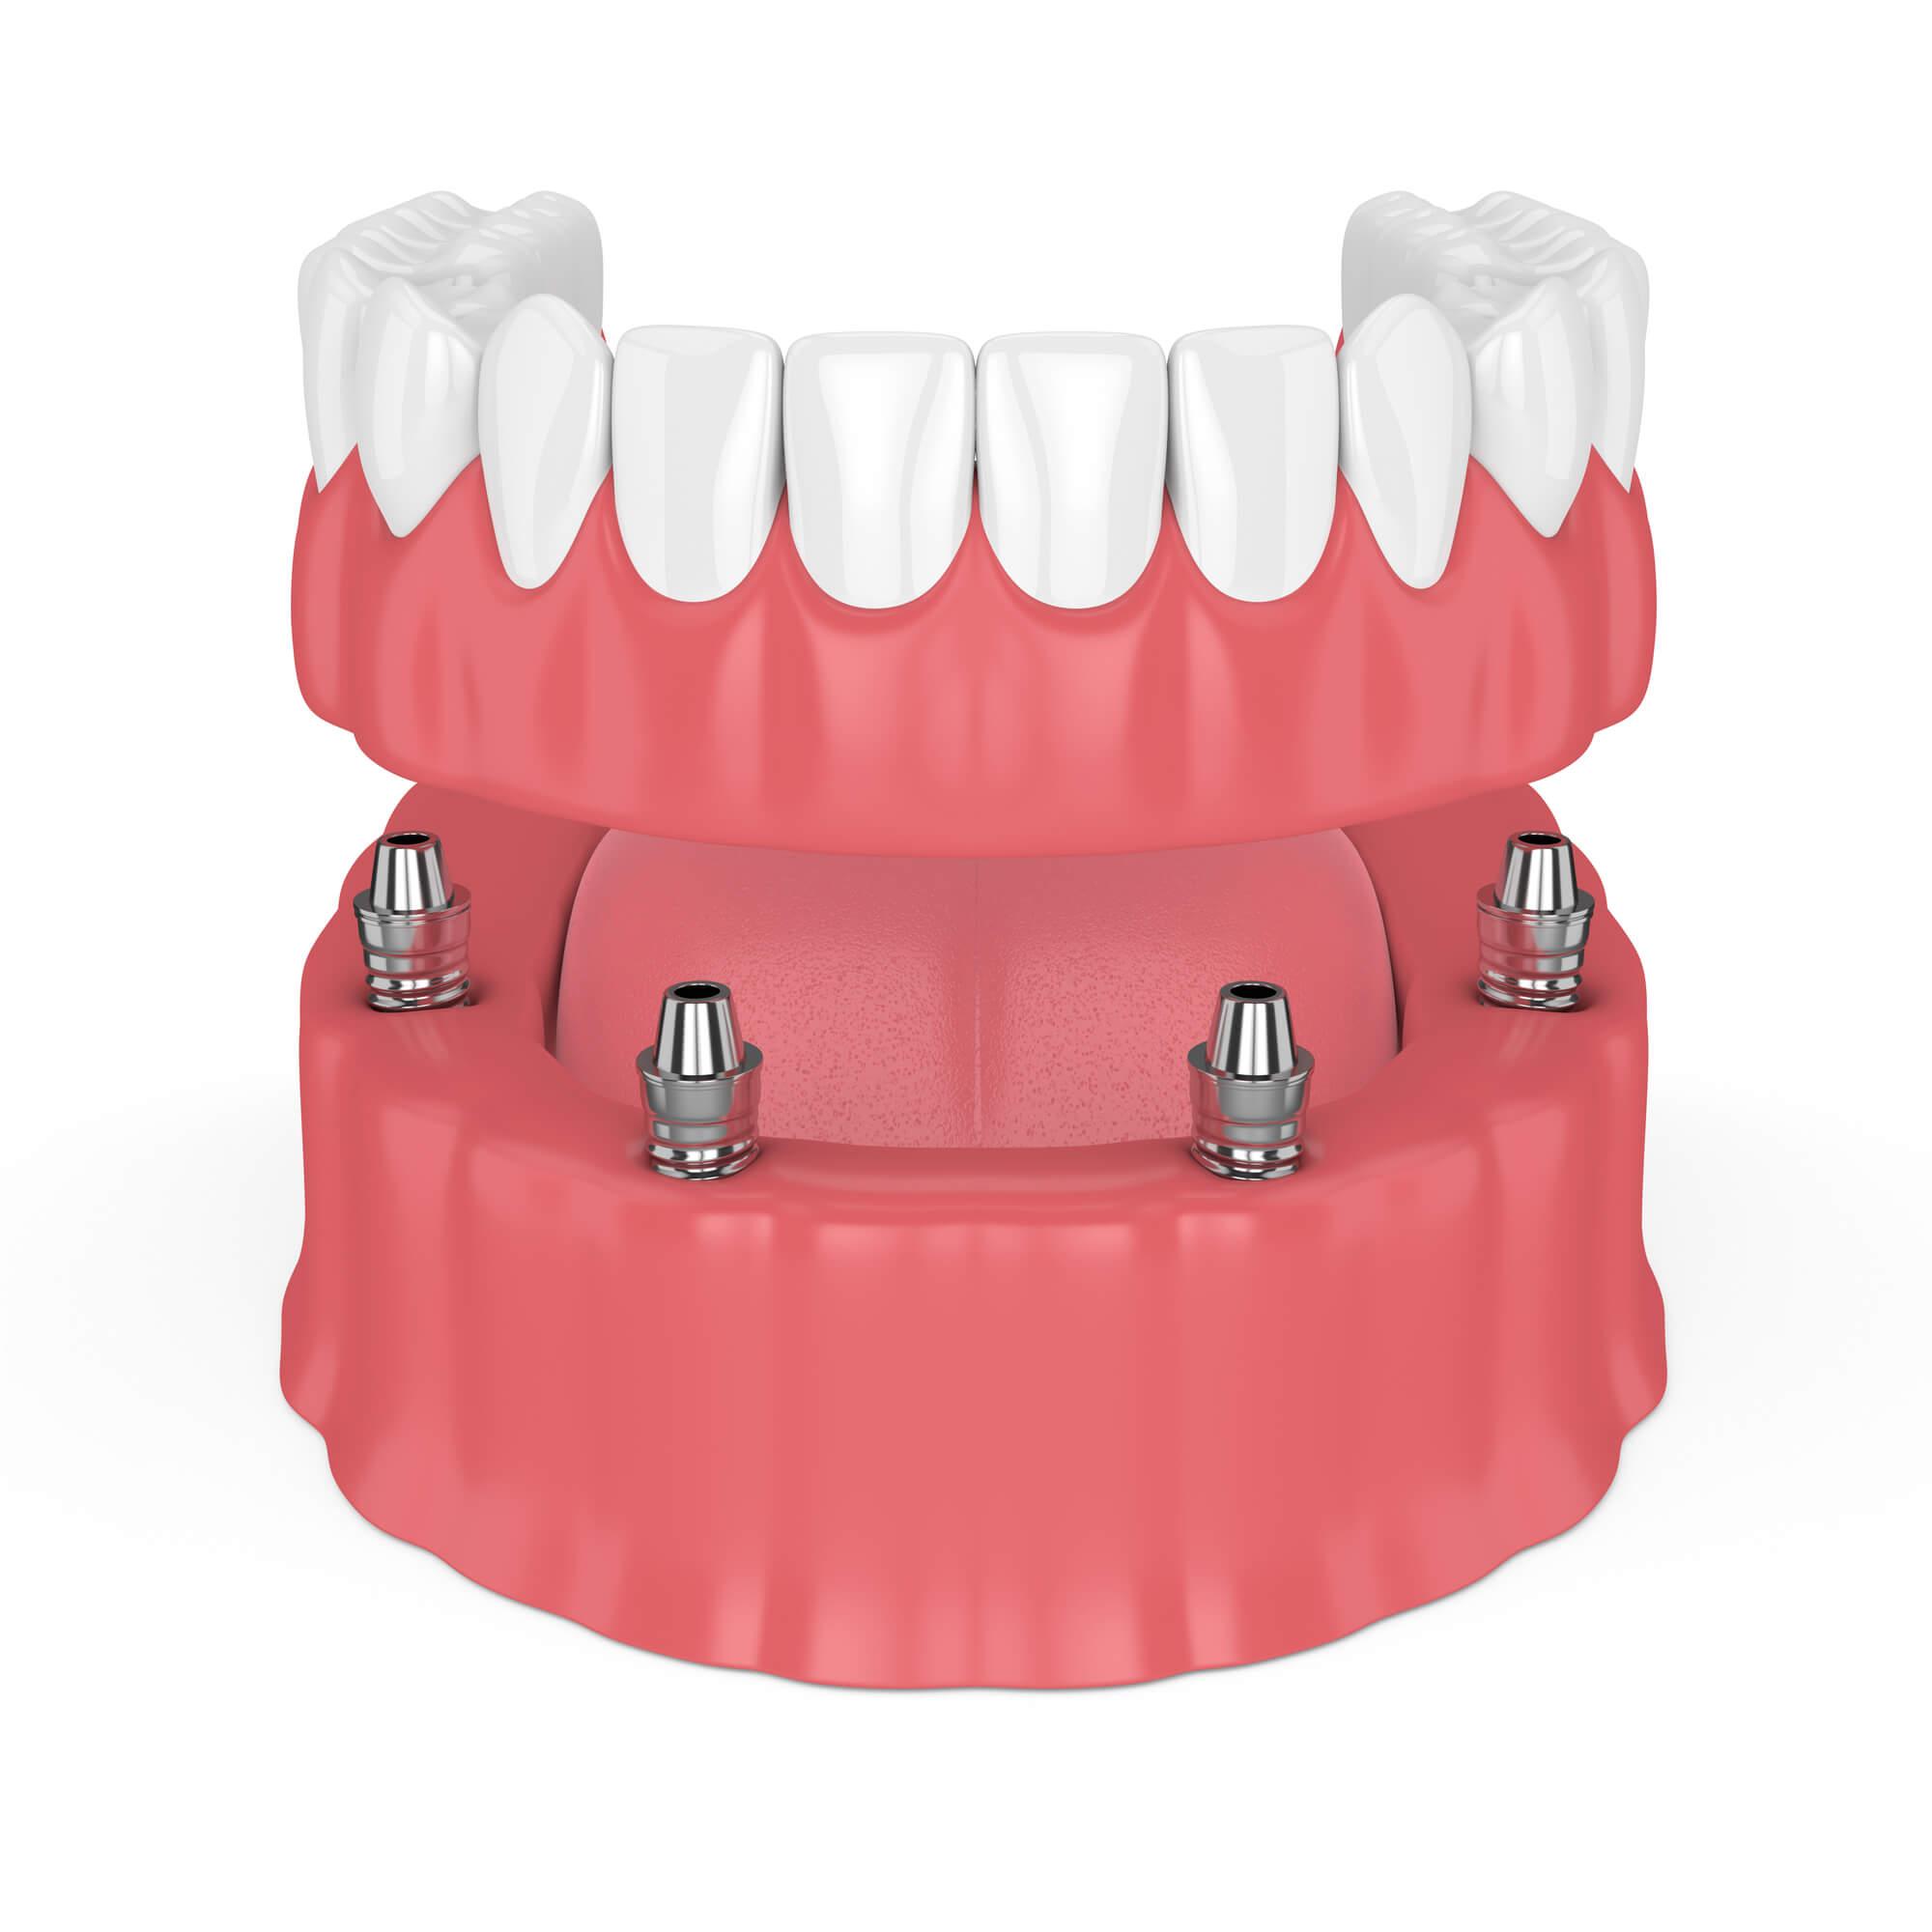 Dentures Palm Beach Gardens | 2 Main Types of Denture Implants